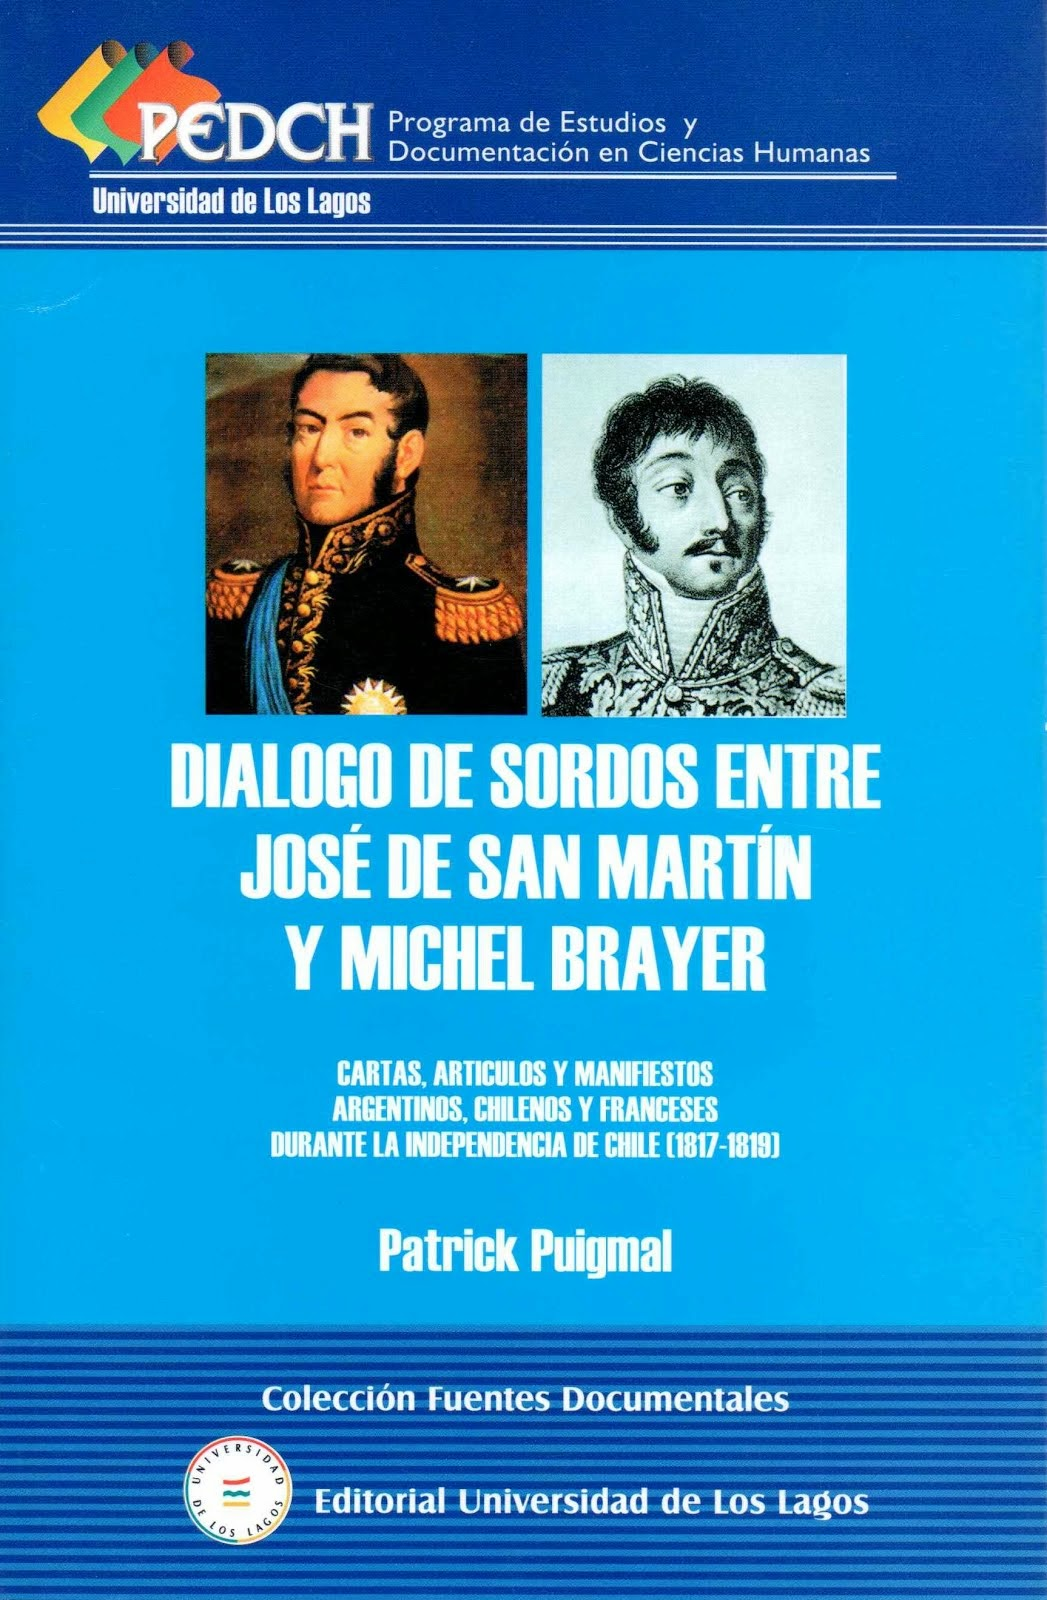 Dialogo de sordos entre Jose SAN MARTIN y Michel BRAYER